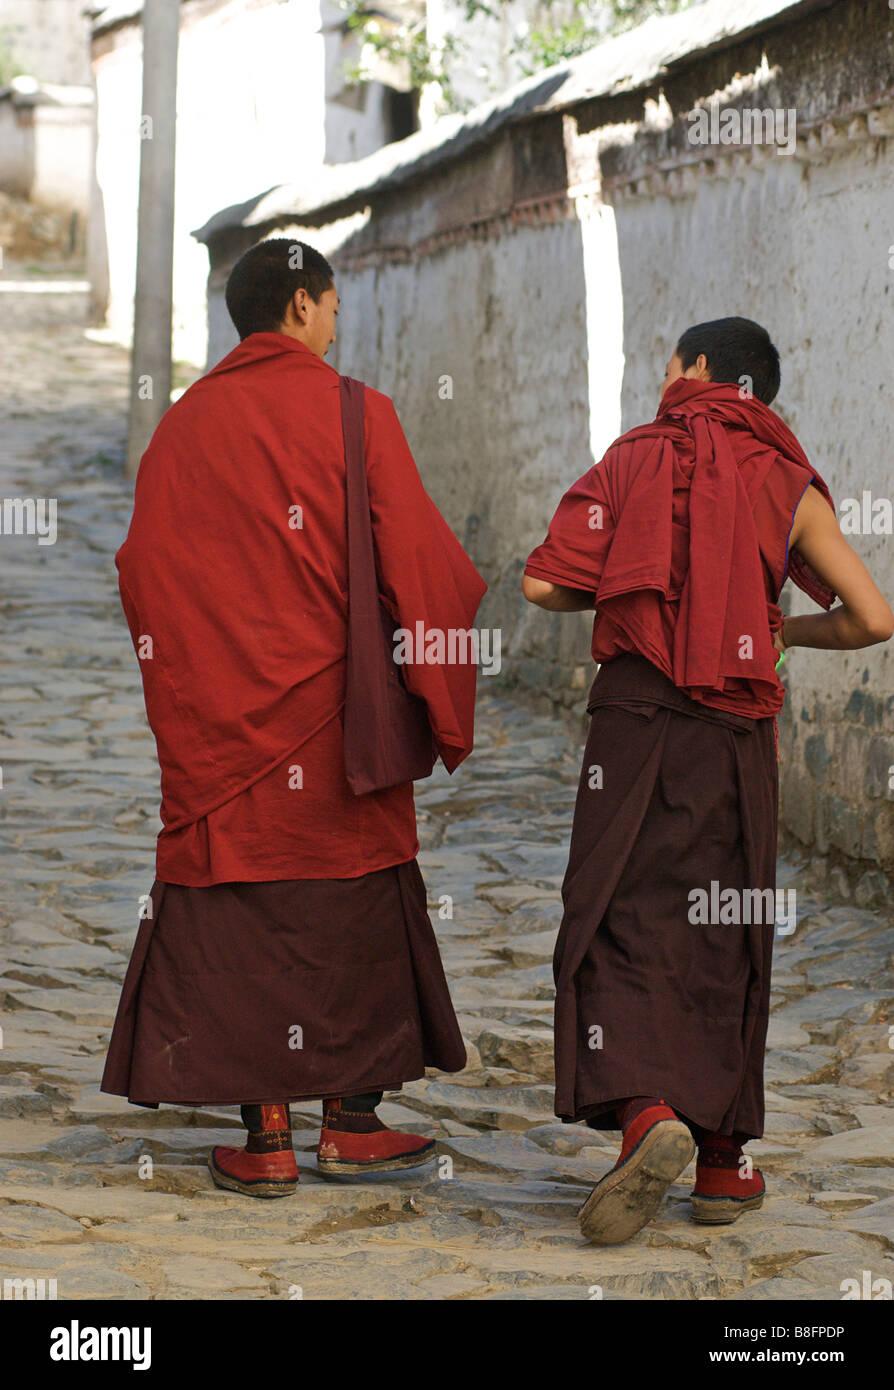 Tibetan monks walking along the narrow streets of  Tashilunpo monastery, Shigatse,Tibet - Stock Image